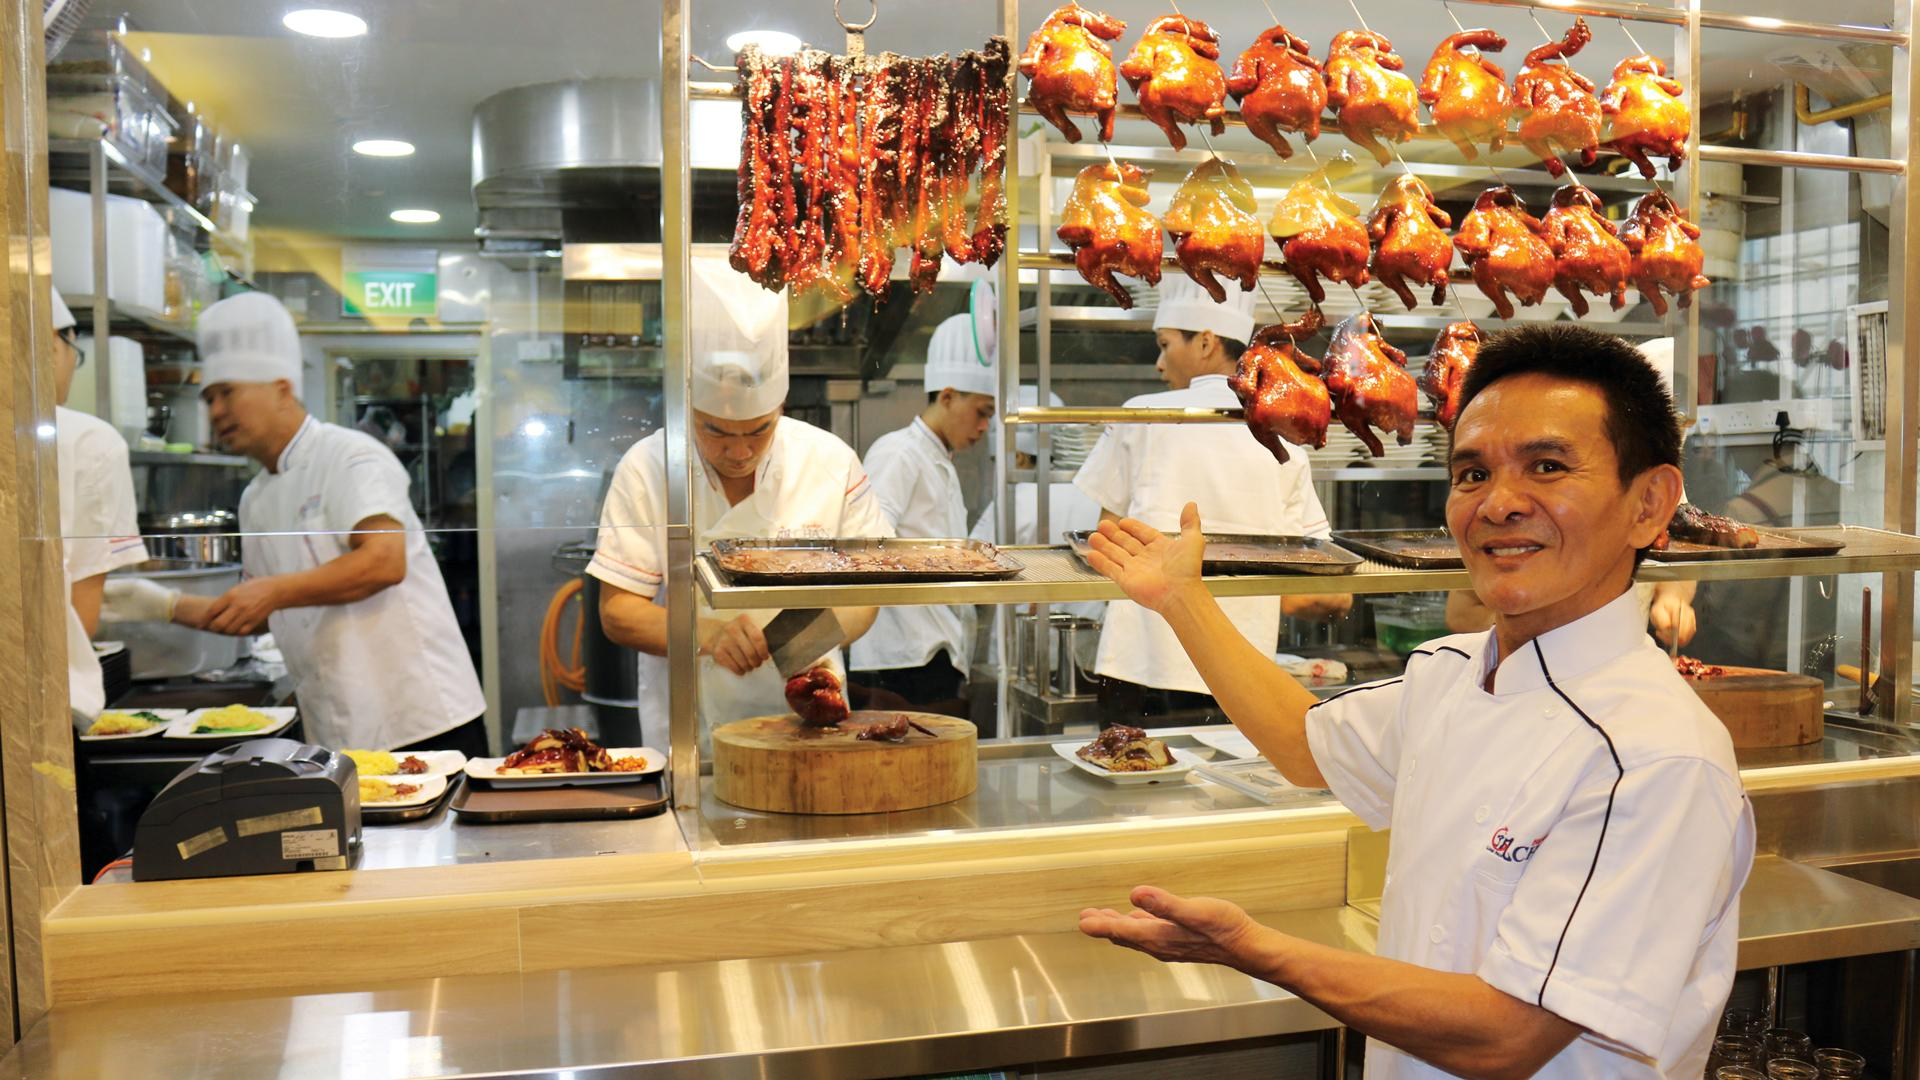 Hawker Chan, a Michelin star restaurant in Singapore